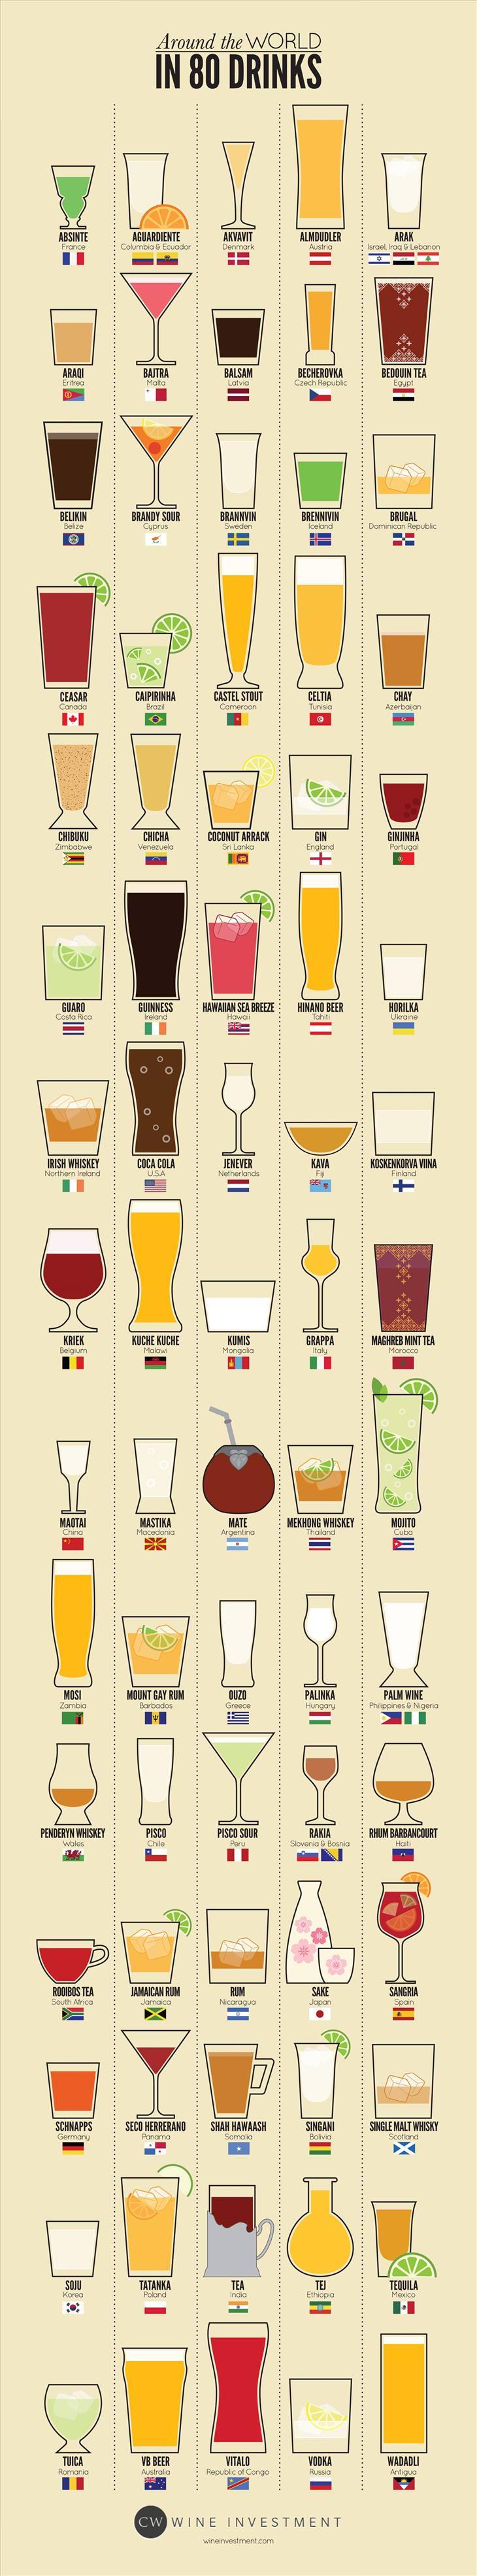 80 drinks infograpic